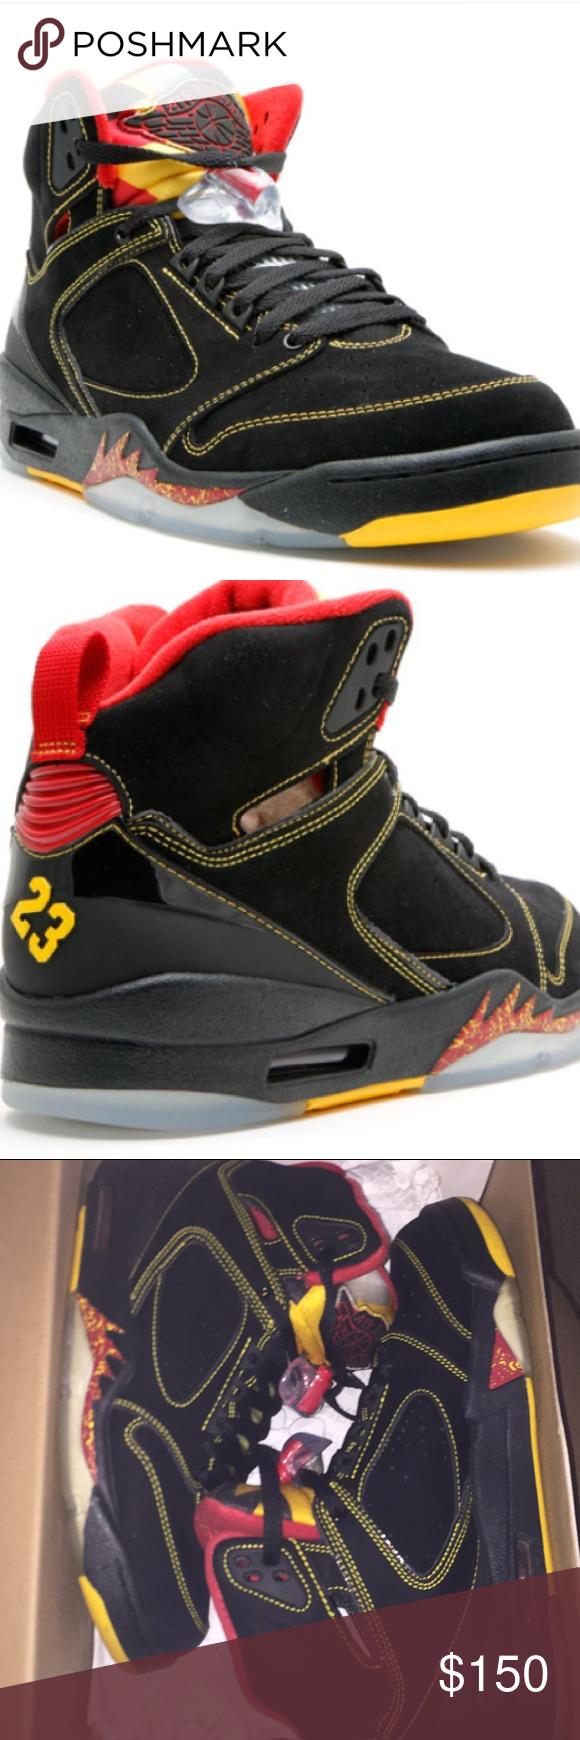 06b1f67e8e Air Jordan Sixty Plus – Atlanta Hawks Nike Air Jordan Sixty Plus Men's  Black/Yellow/Red Sneaker Sz 8- 364806-071 100% Authentic!! Very Good Used  Condition!